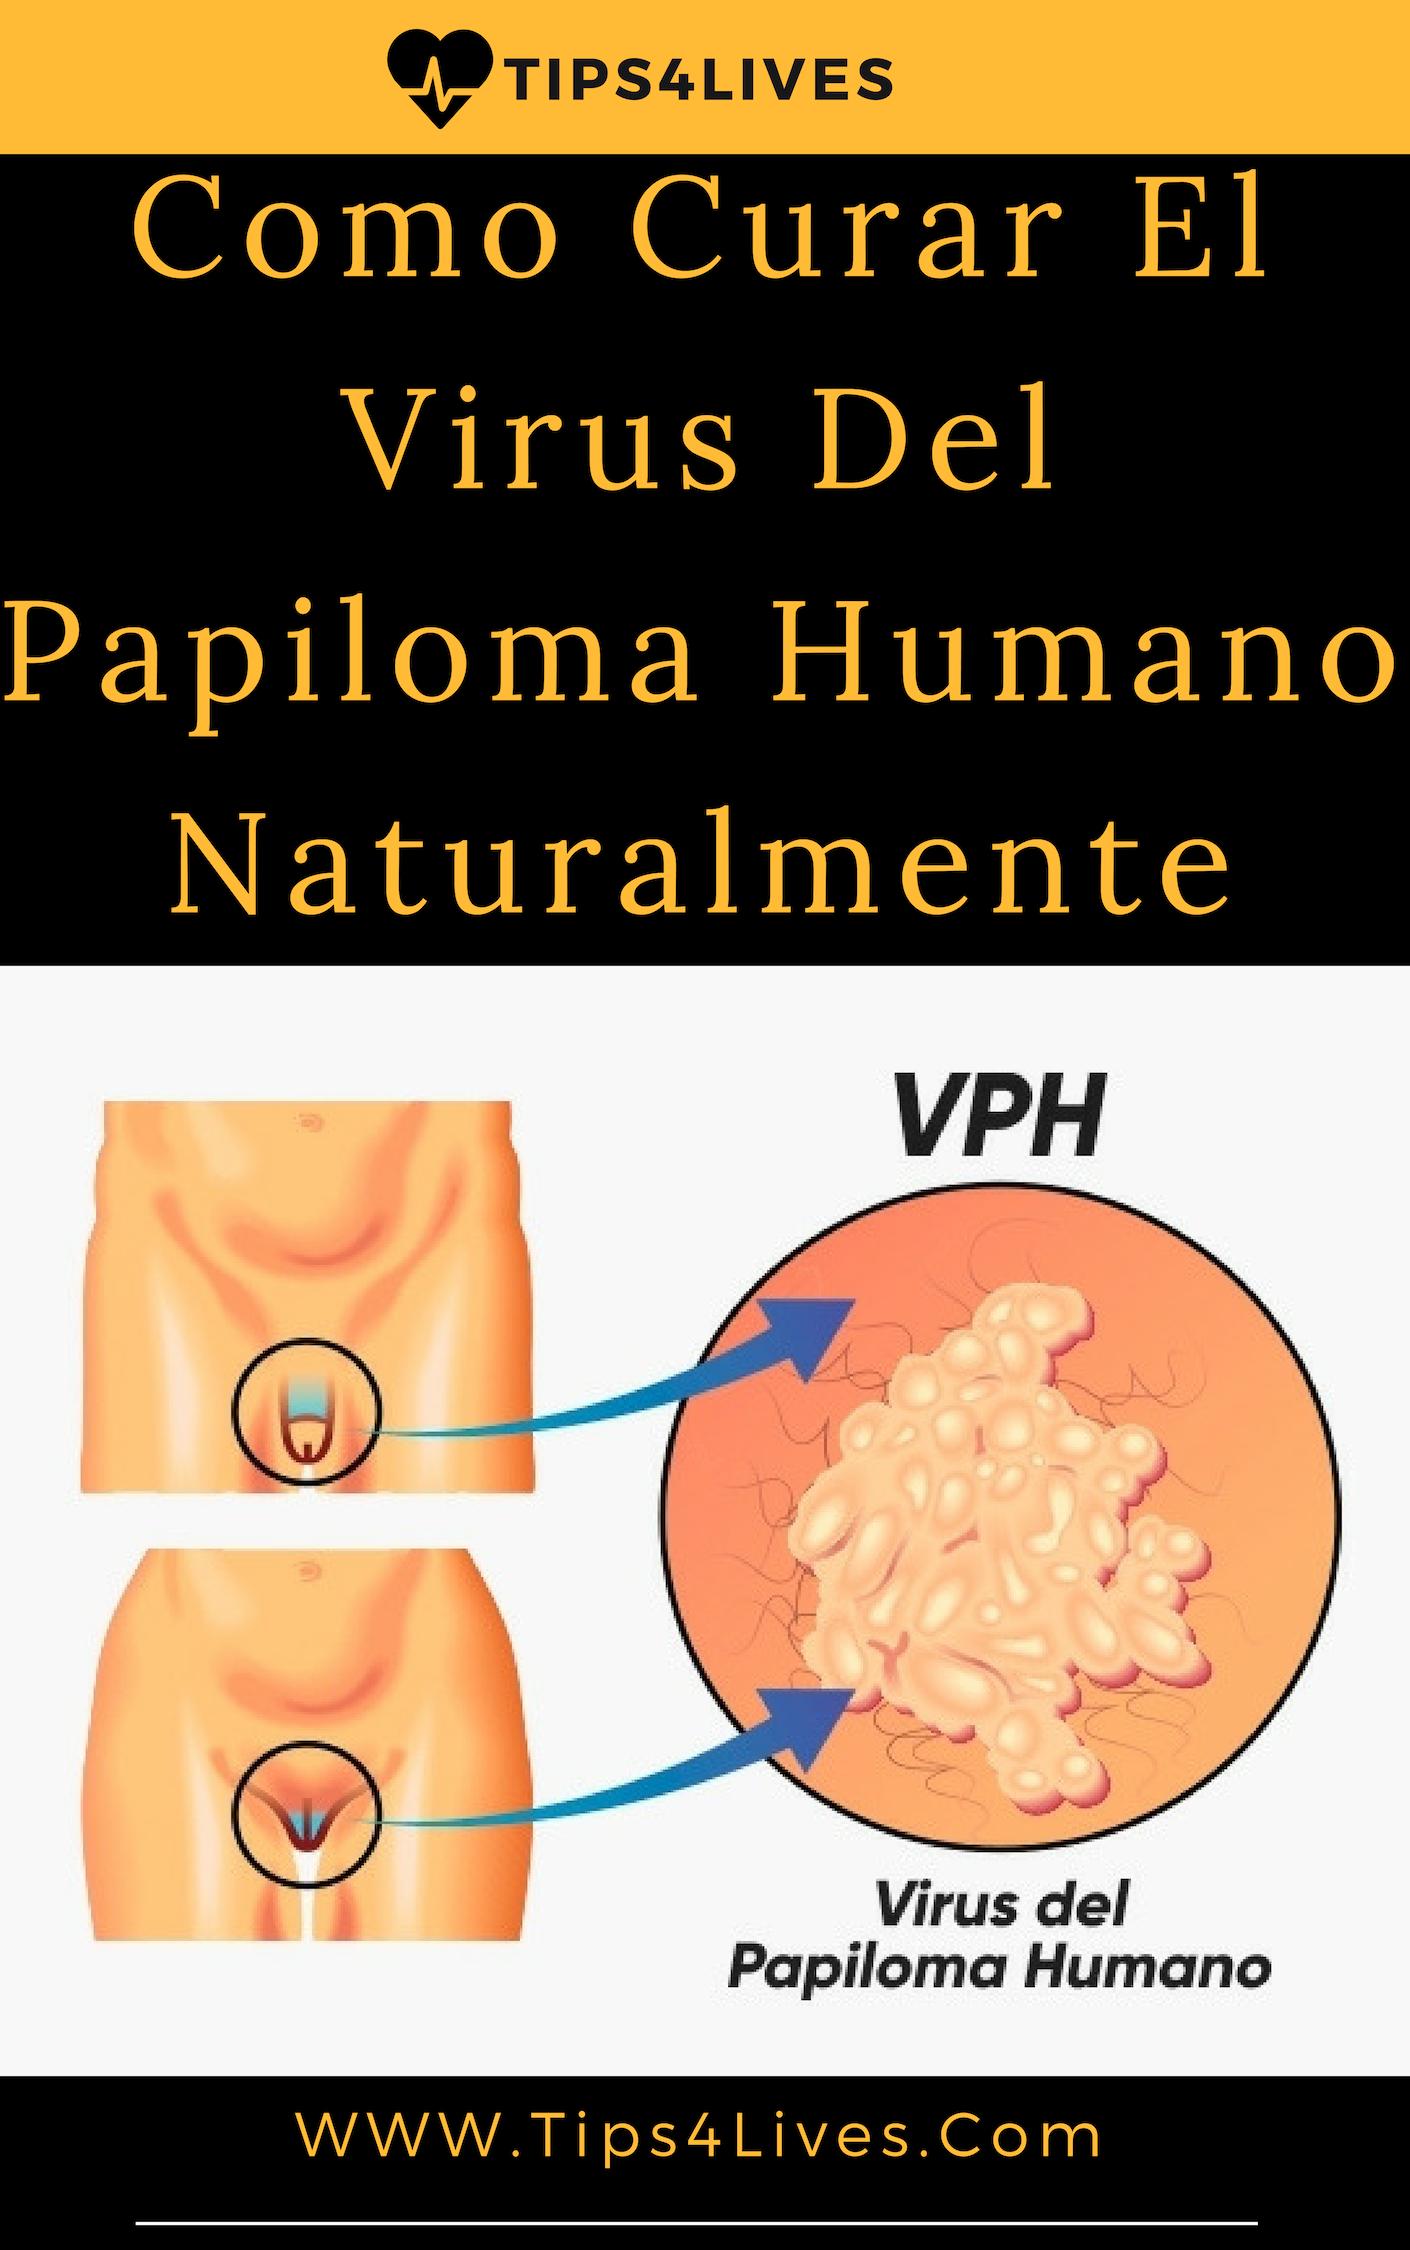 papiloma humano recetas caseras exophytic growth papilloma